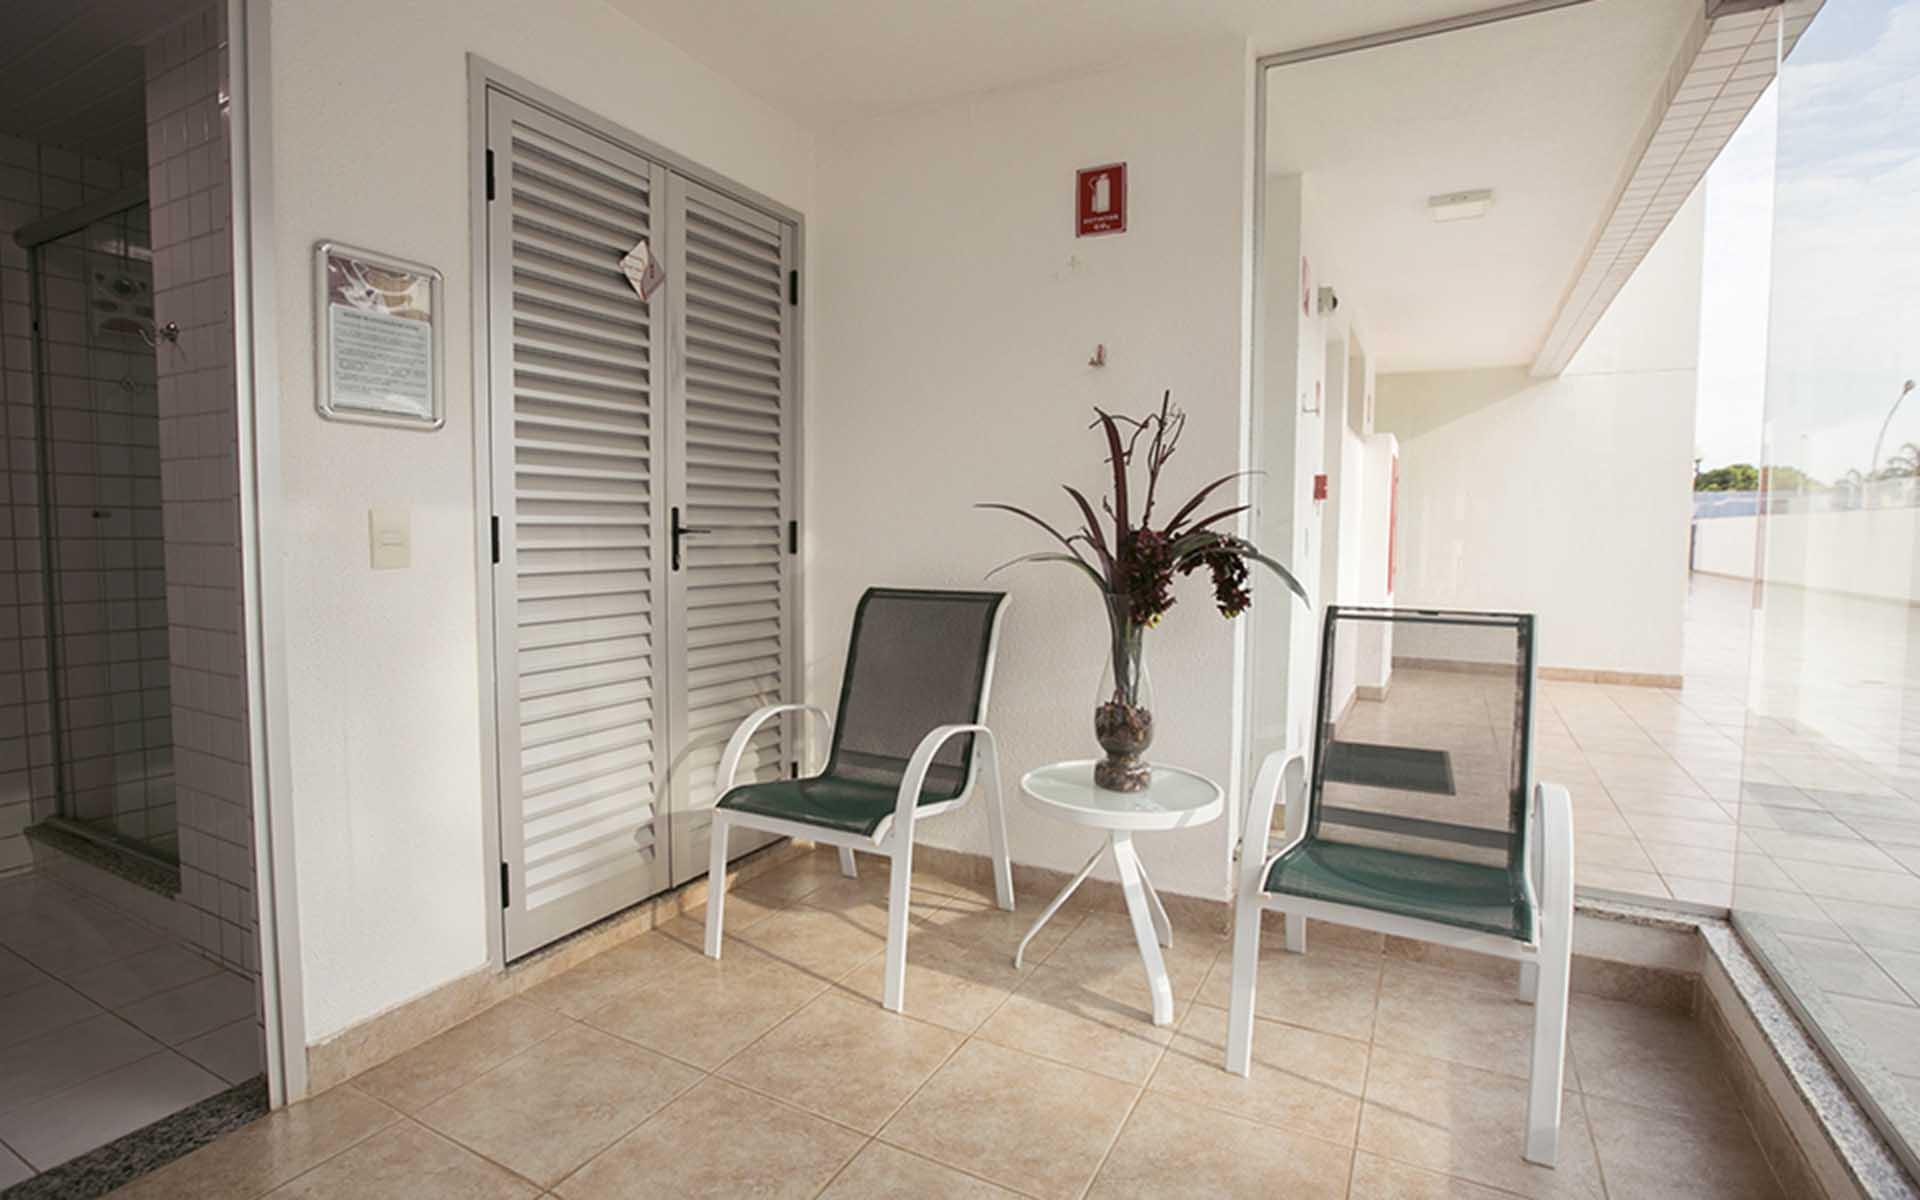 sauna do apart hotel flat em brasilia premier hplus long stay